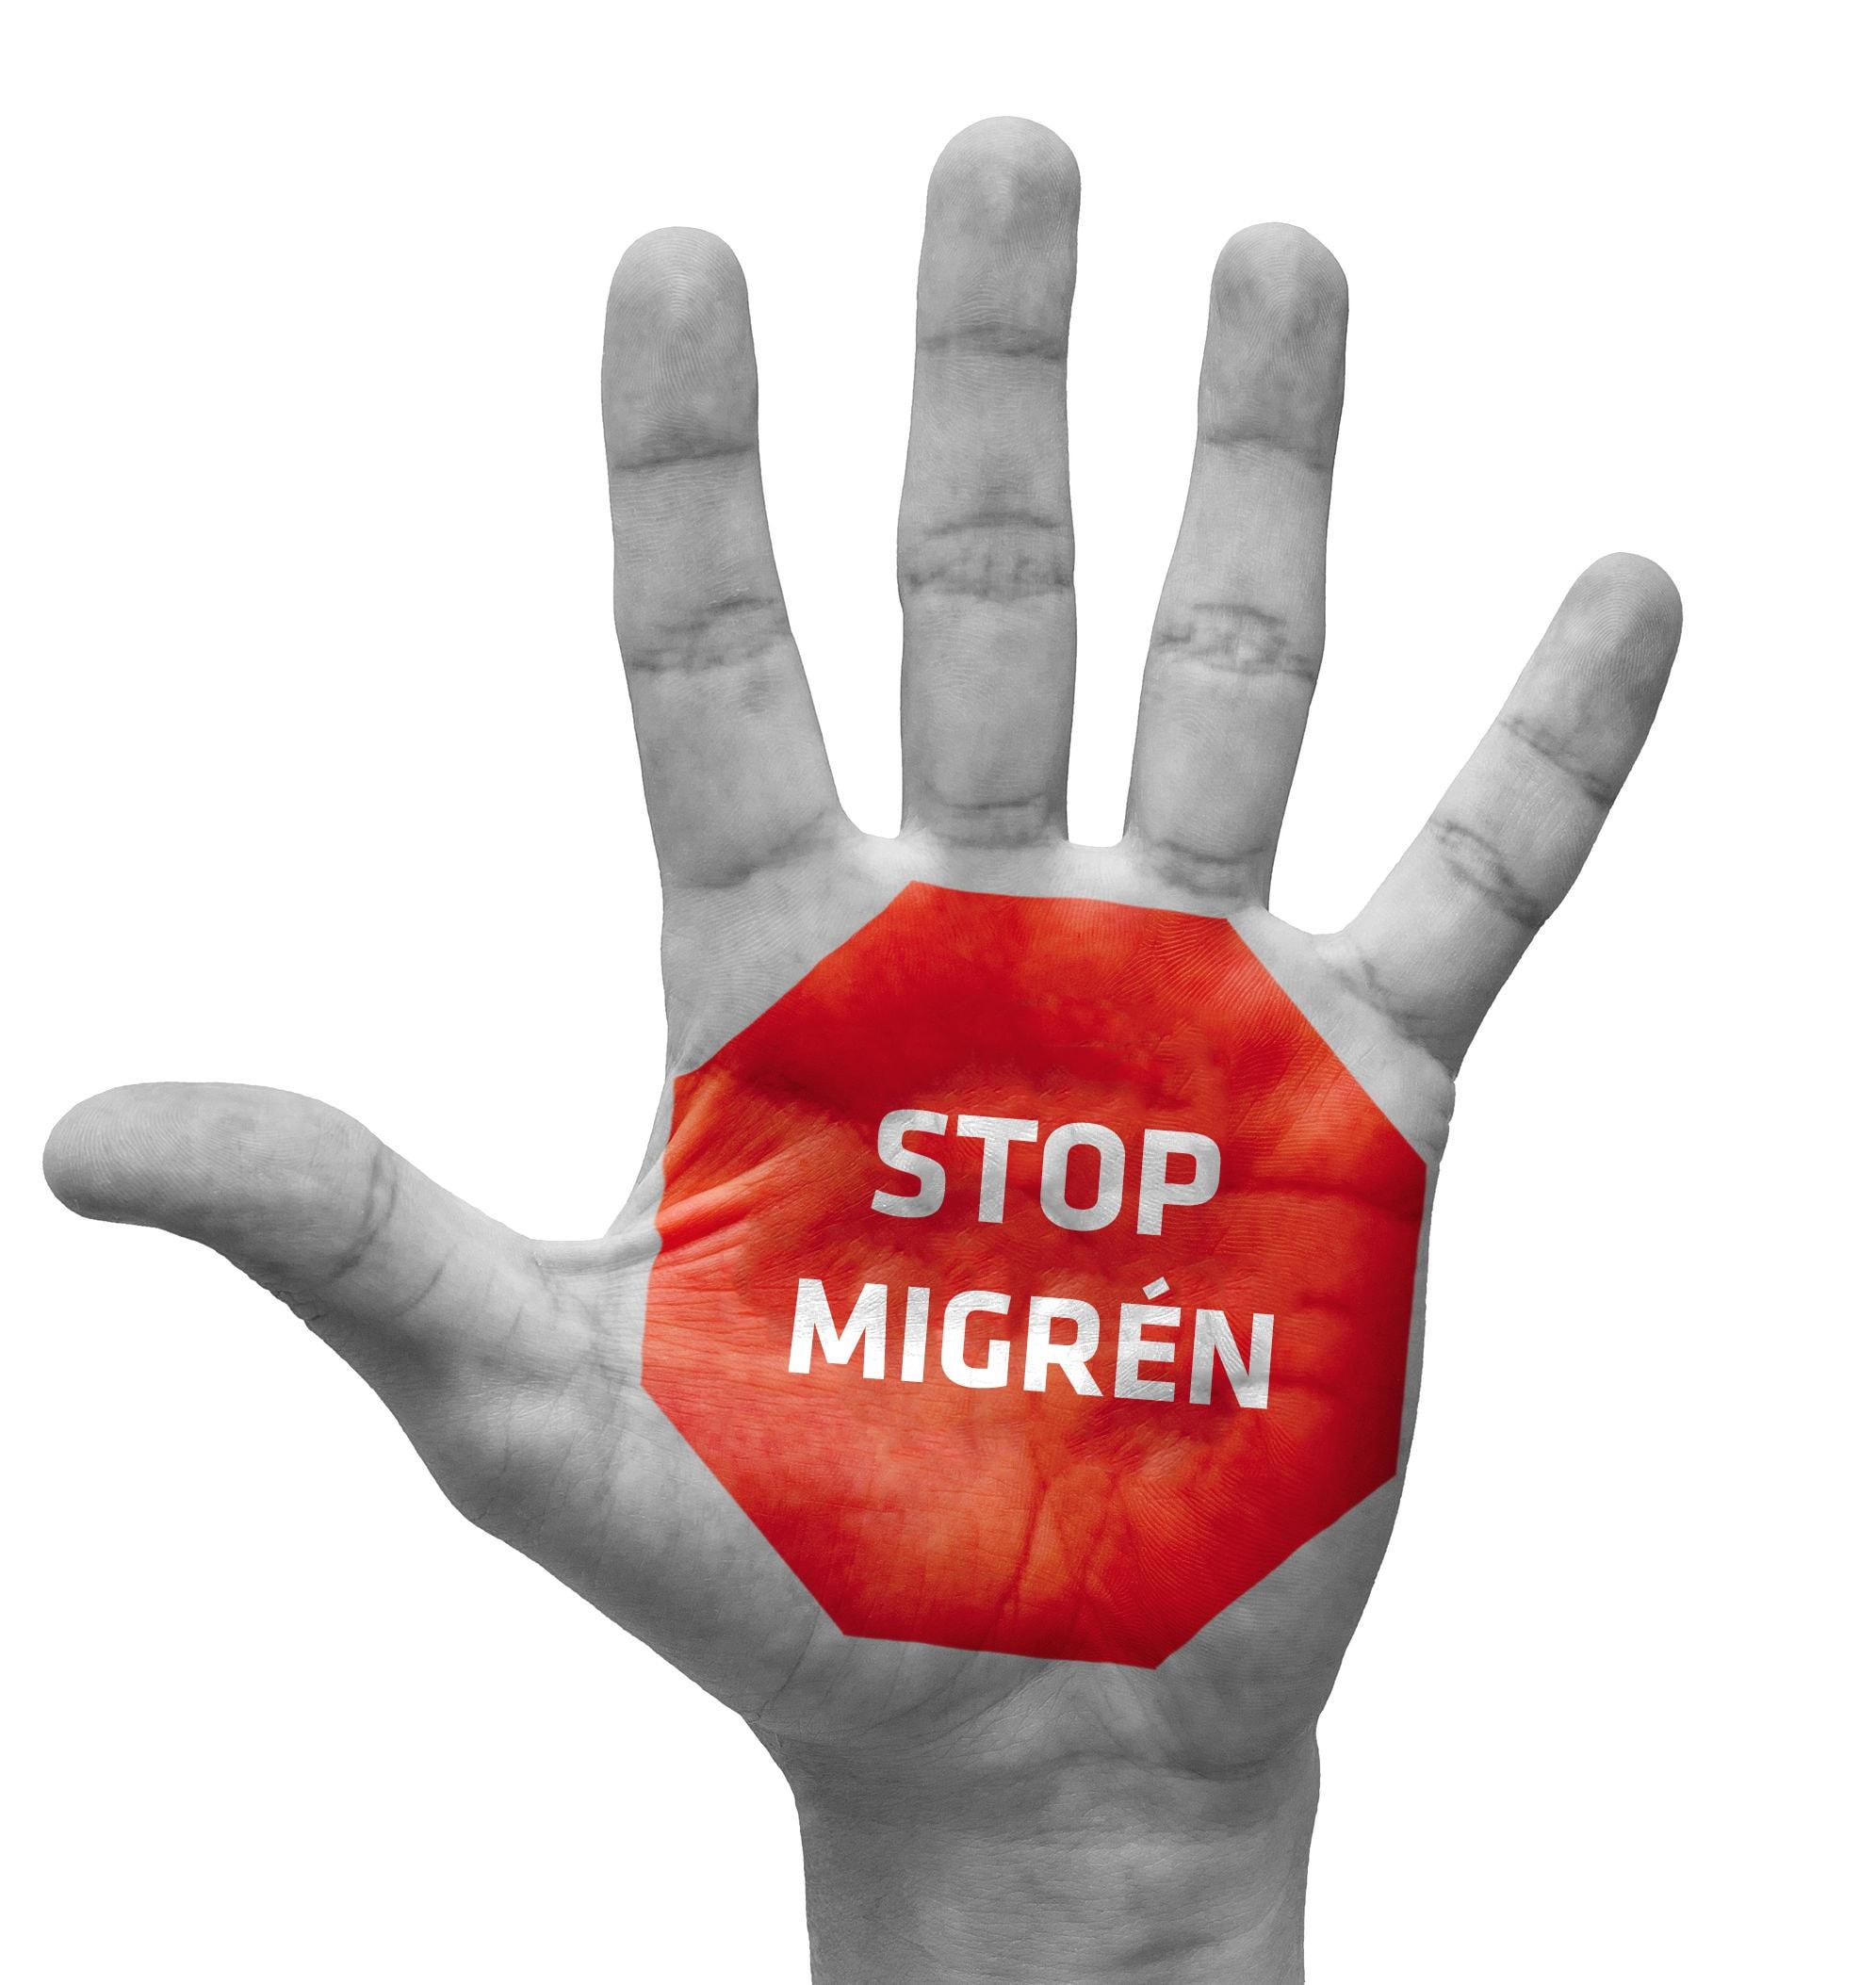 Stop Migrén